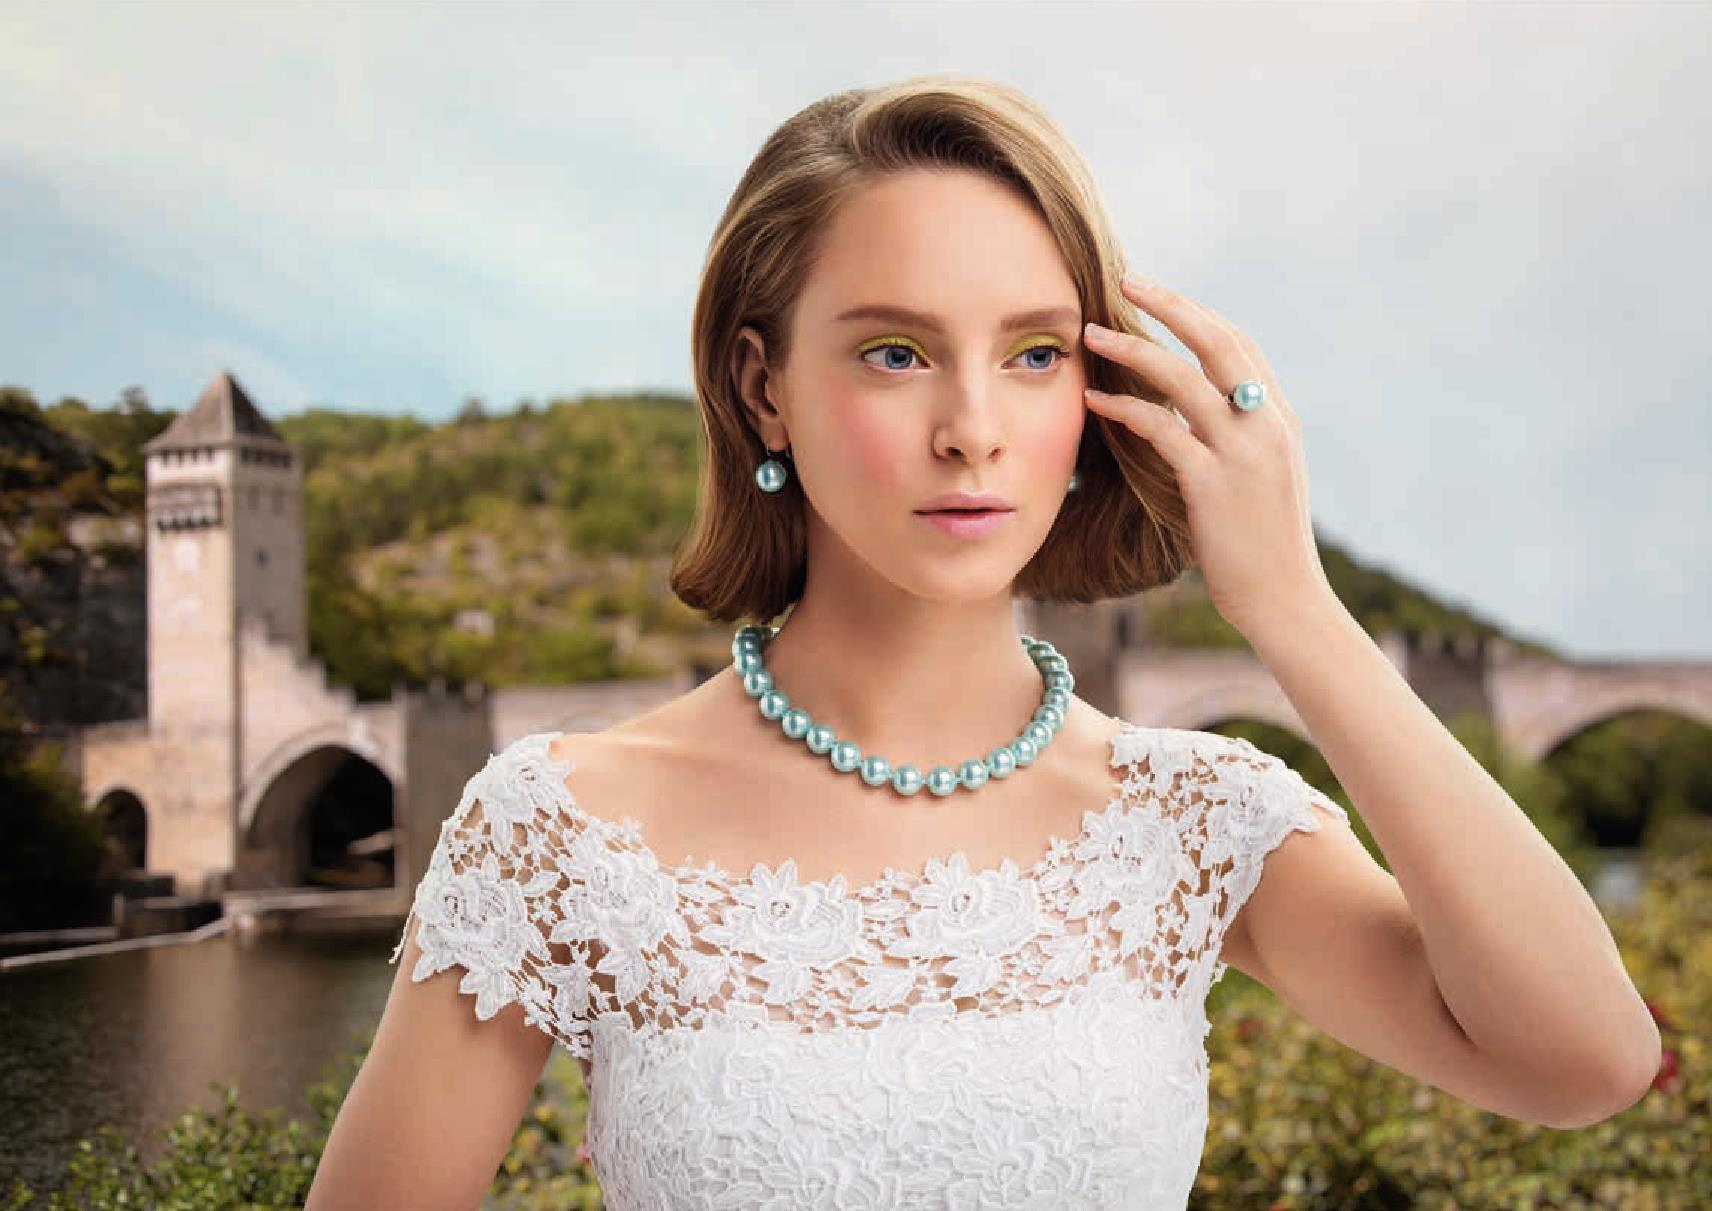 Флоранж Ожерелье, серьги, кольцо La tendresse Нежность